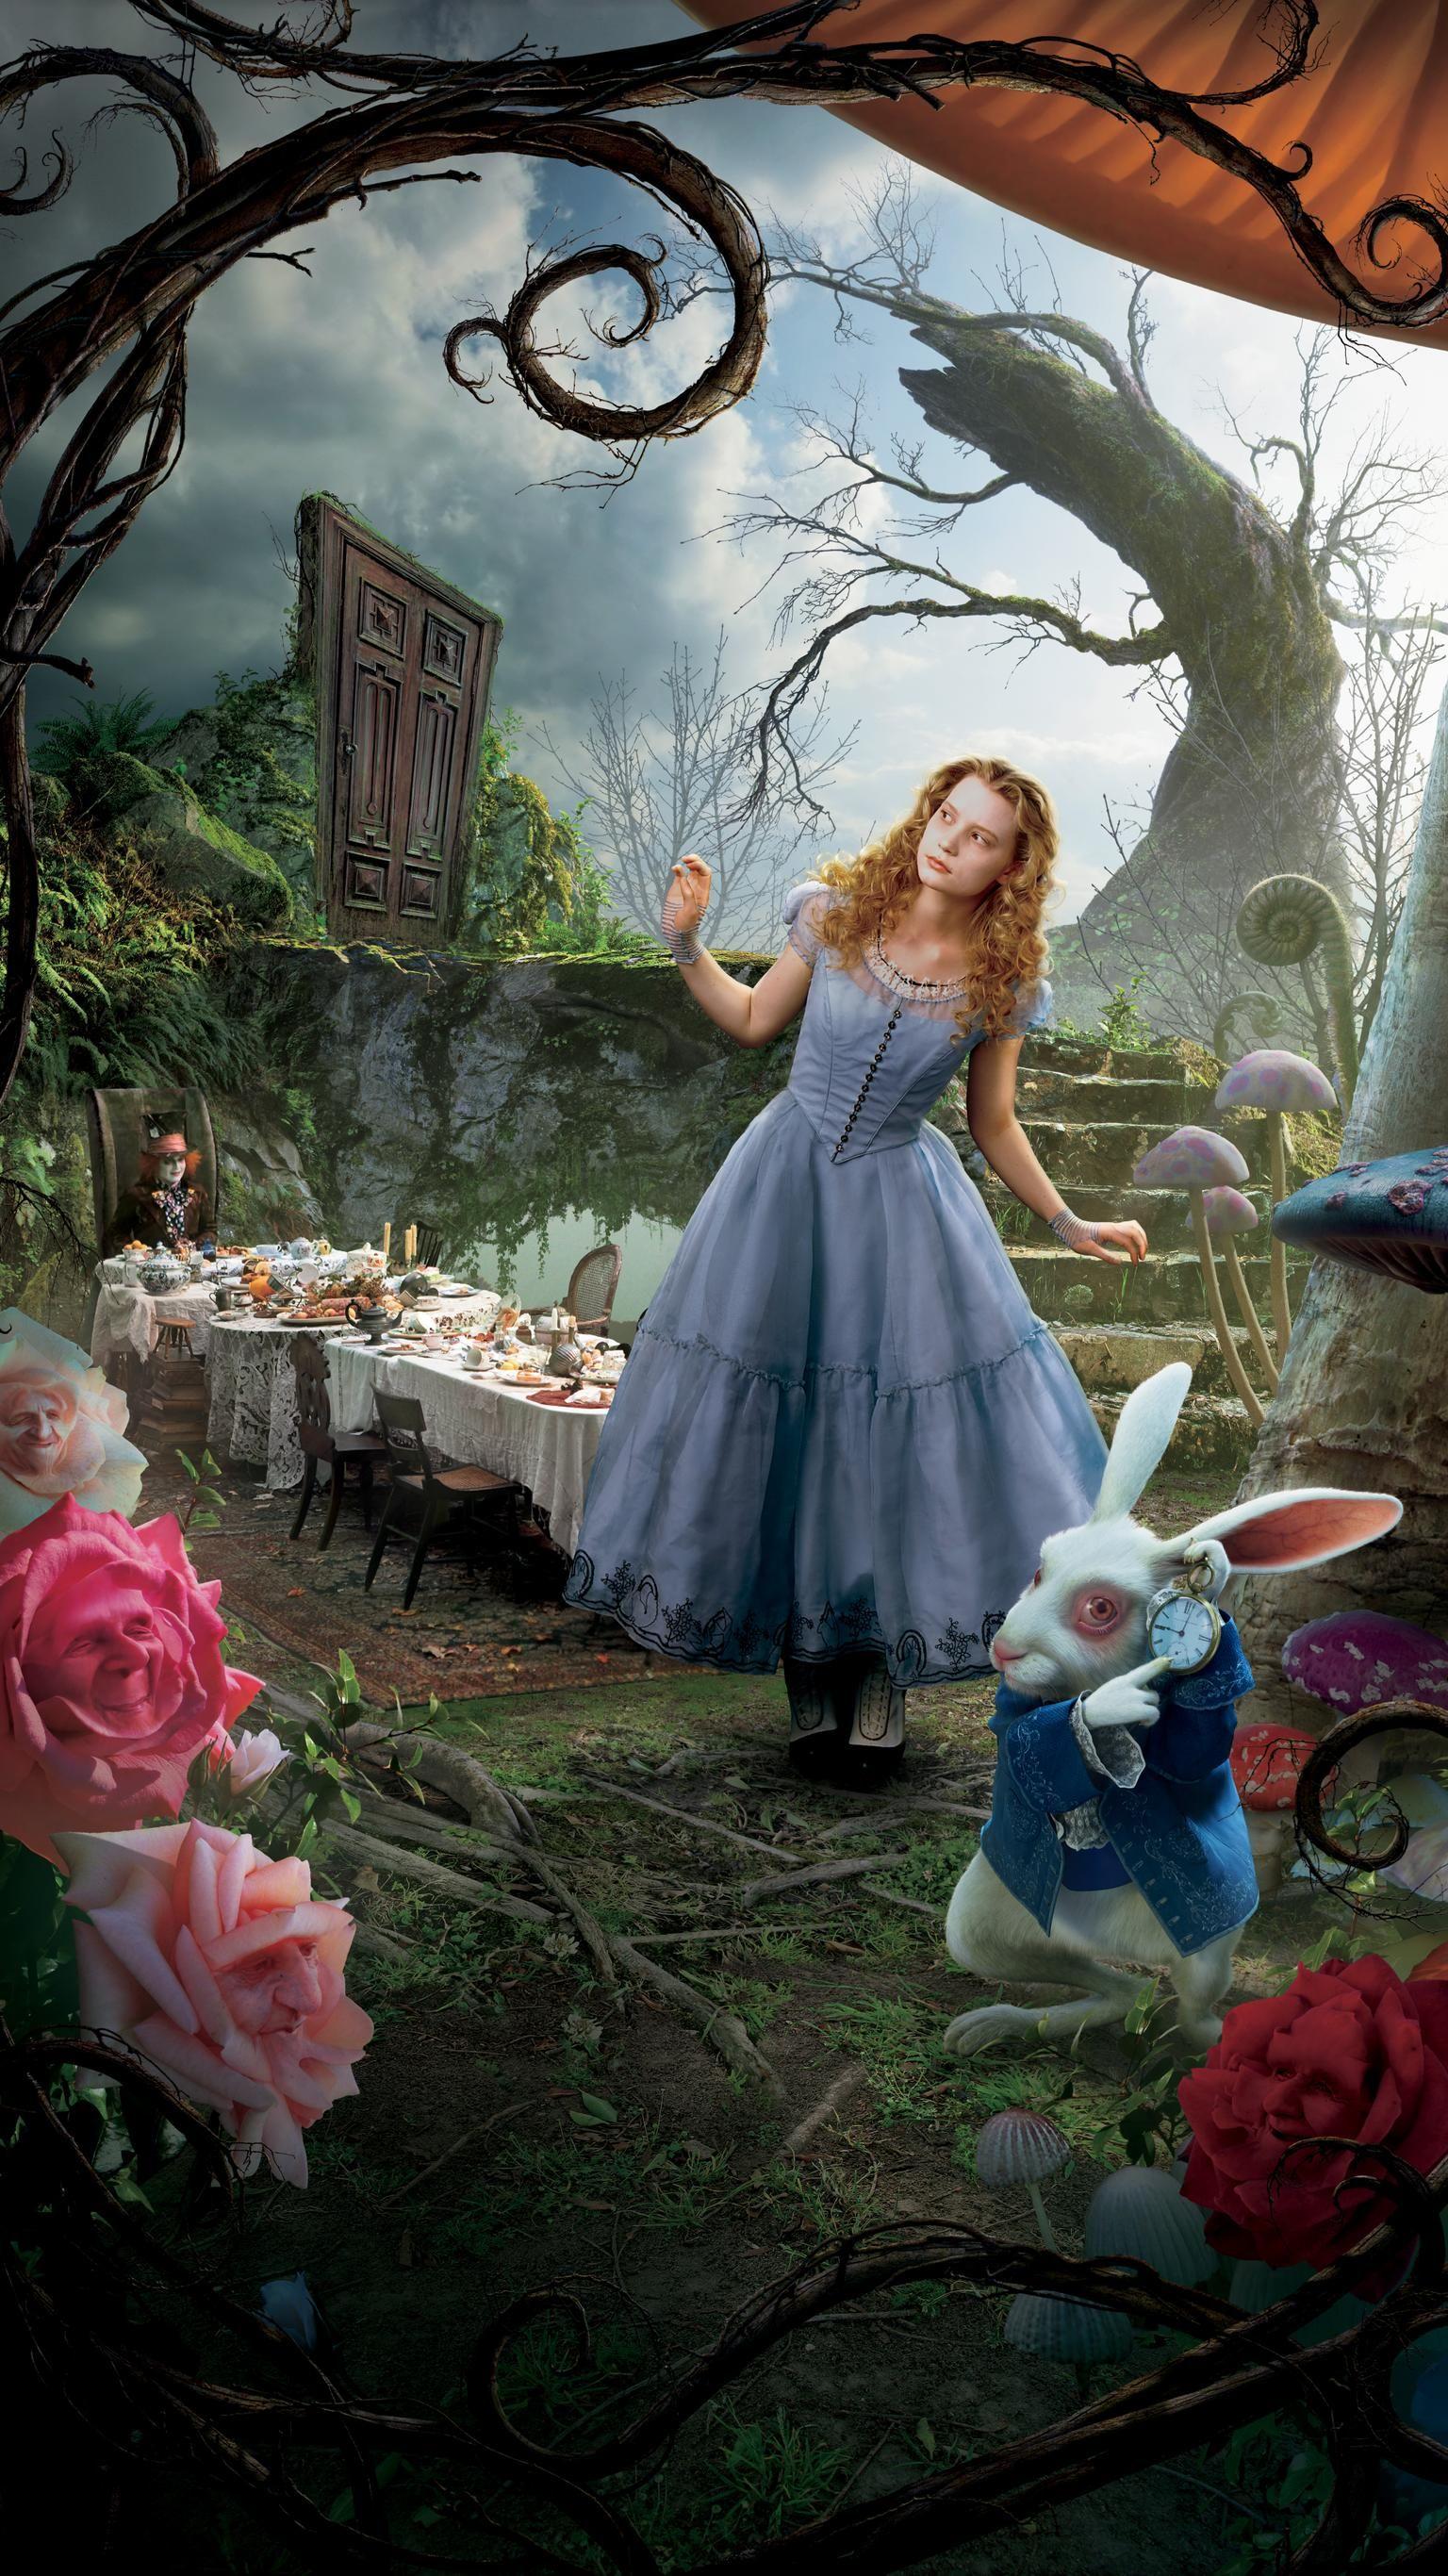 Alice In Wonderland 2010 Phone Wallpaper Com Imagens Filme